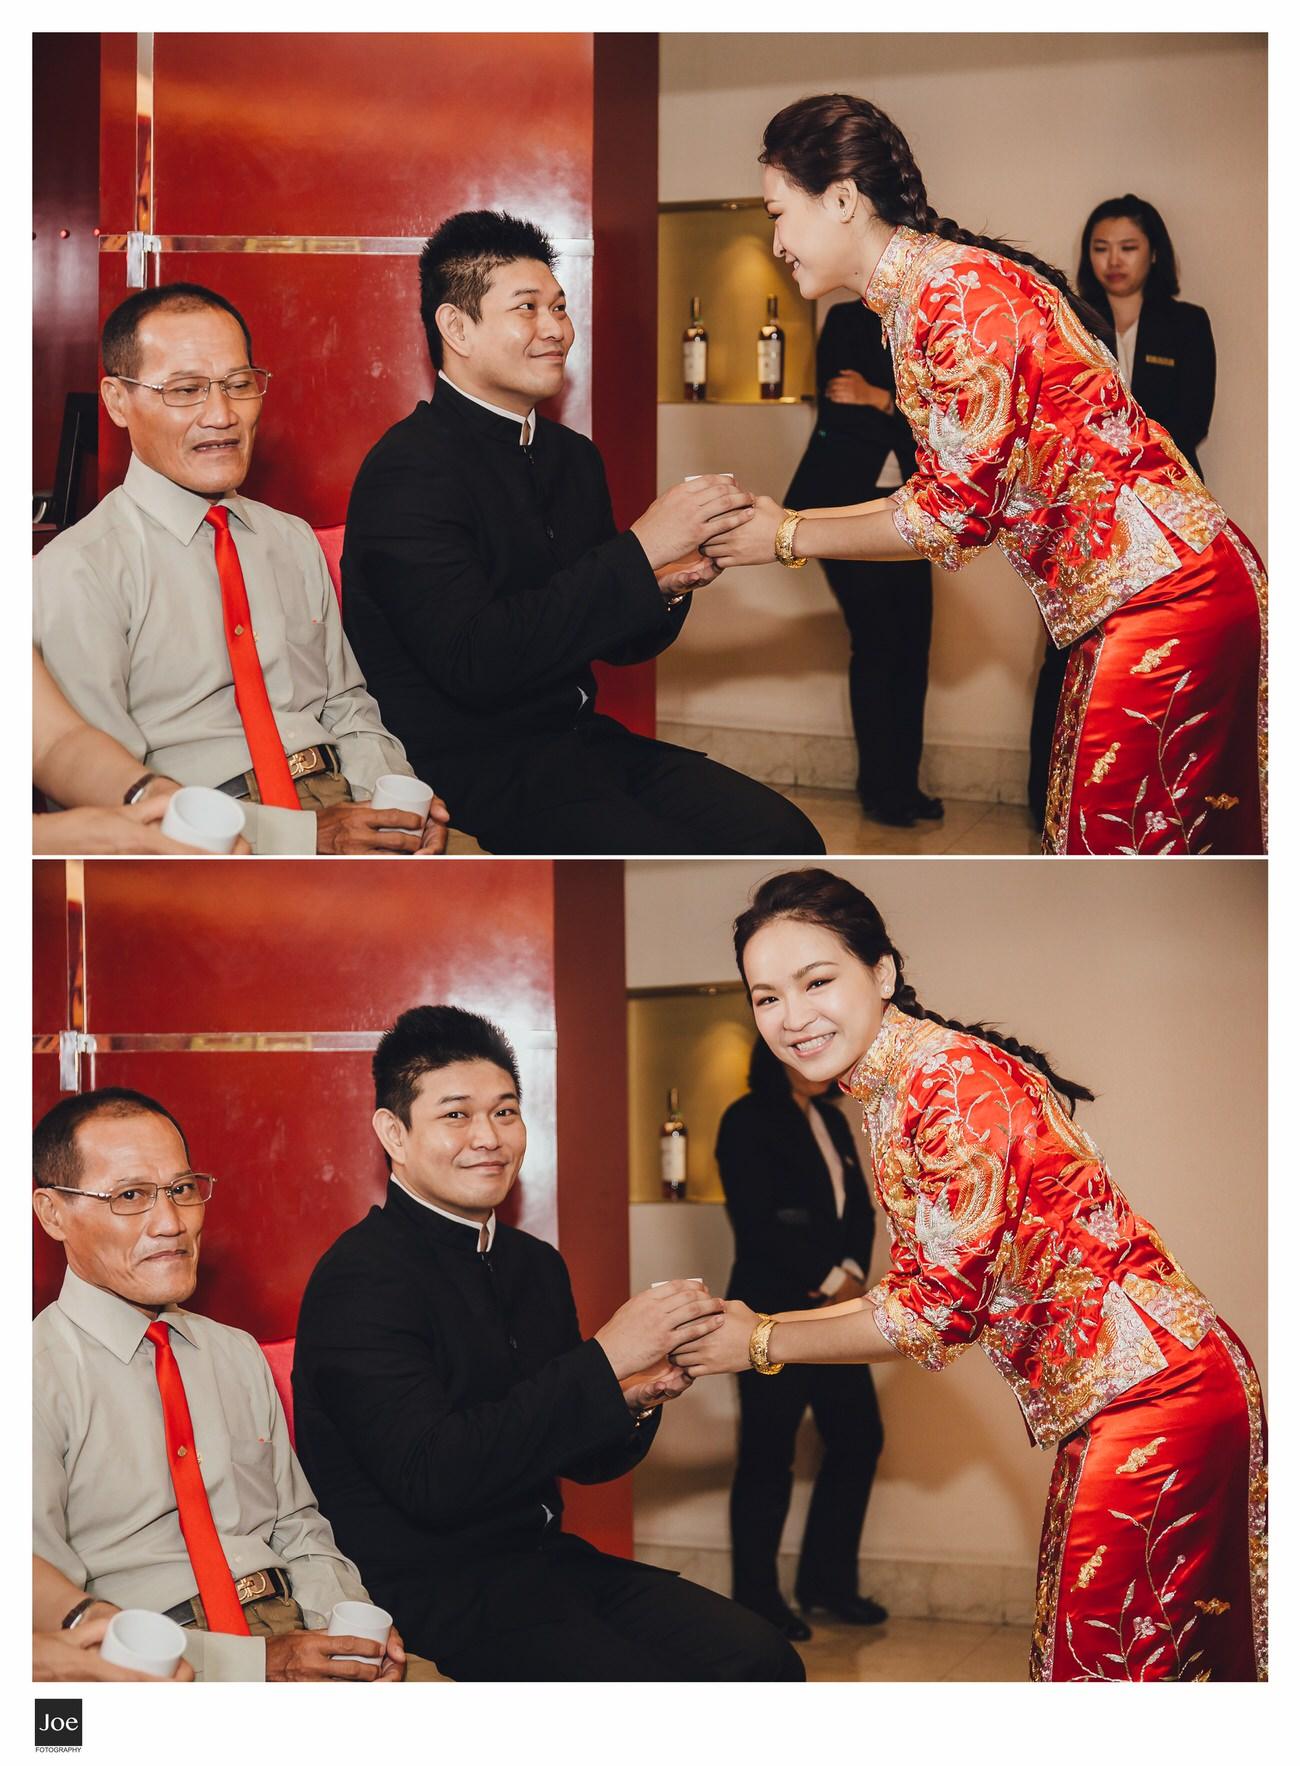 grand-hilai-hotel-wedding-daniel-yvette-joe-fotography-034.jpg